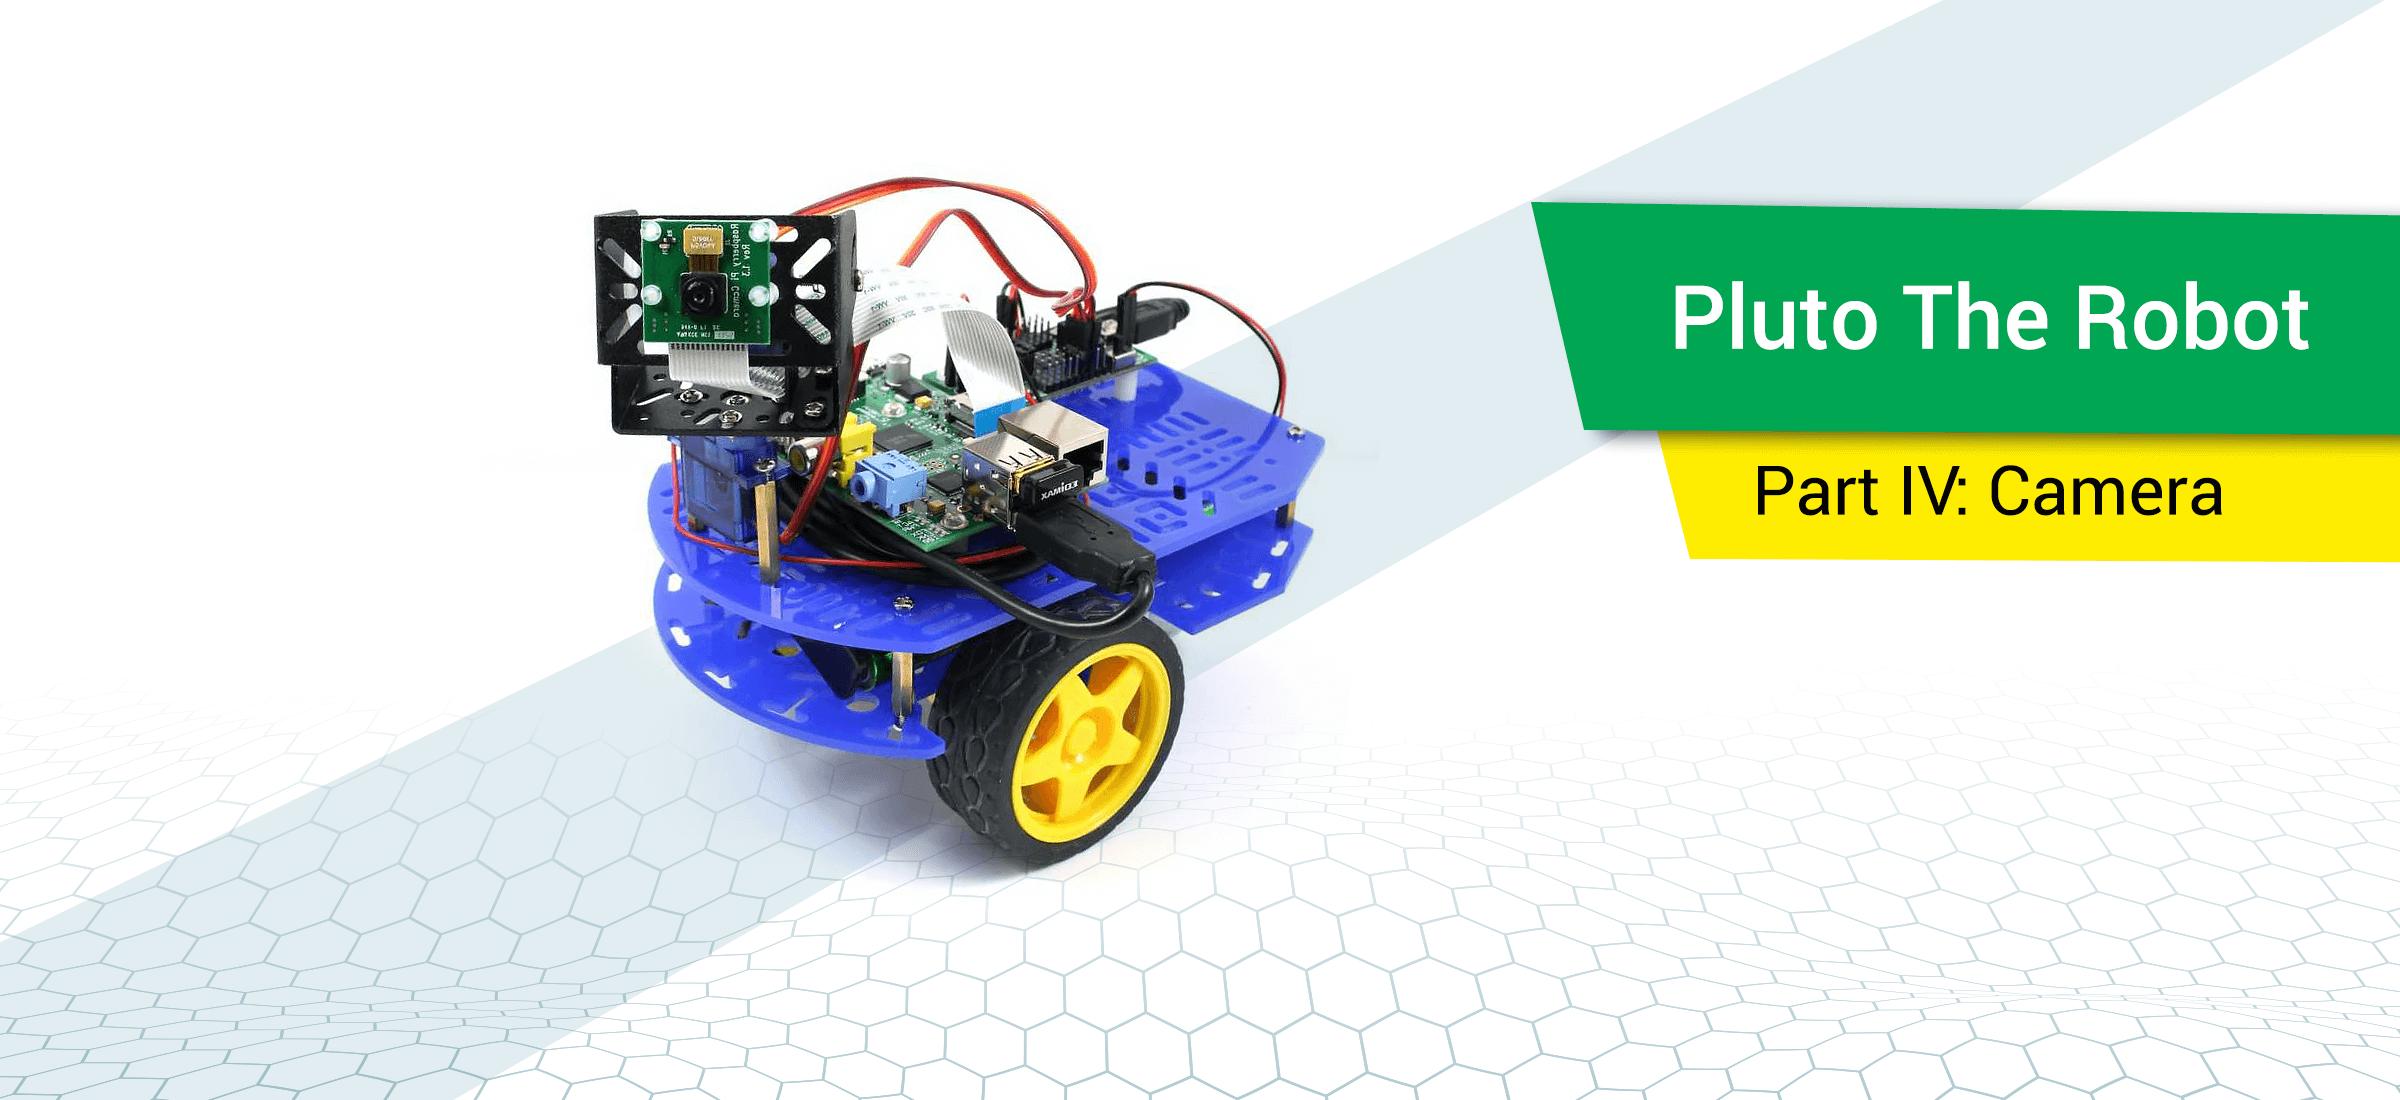 Building Pluto The Robot, Part IV: Camera